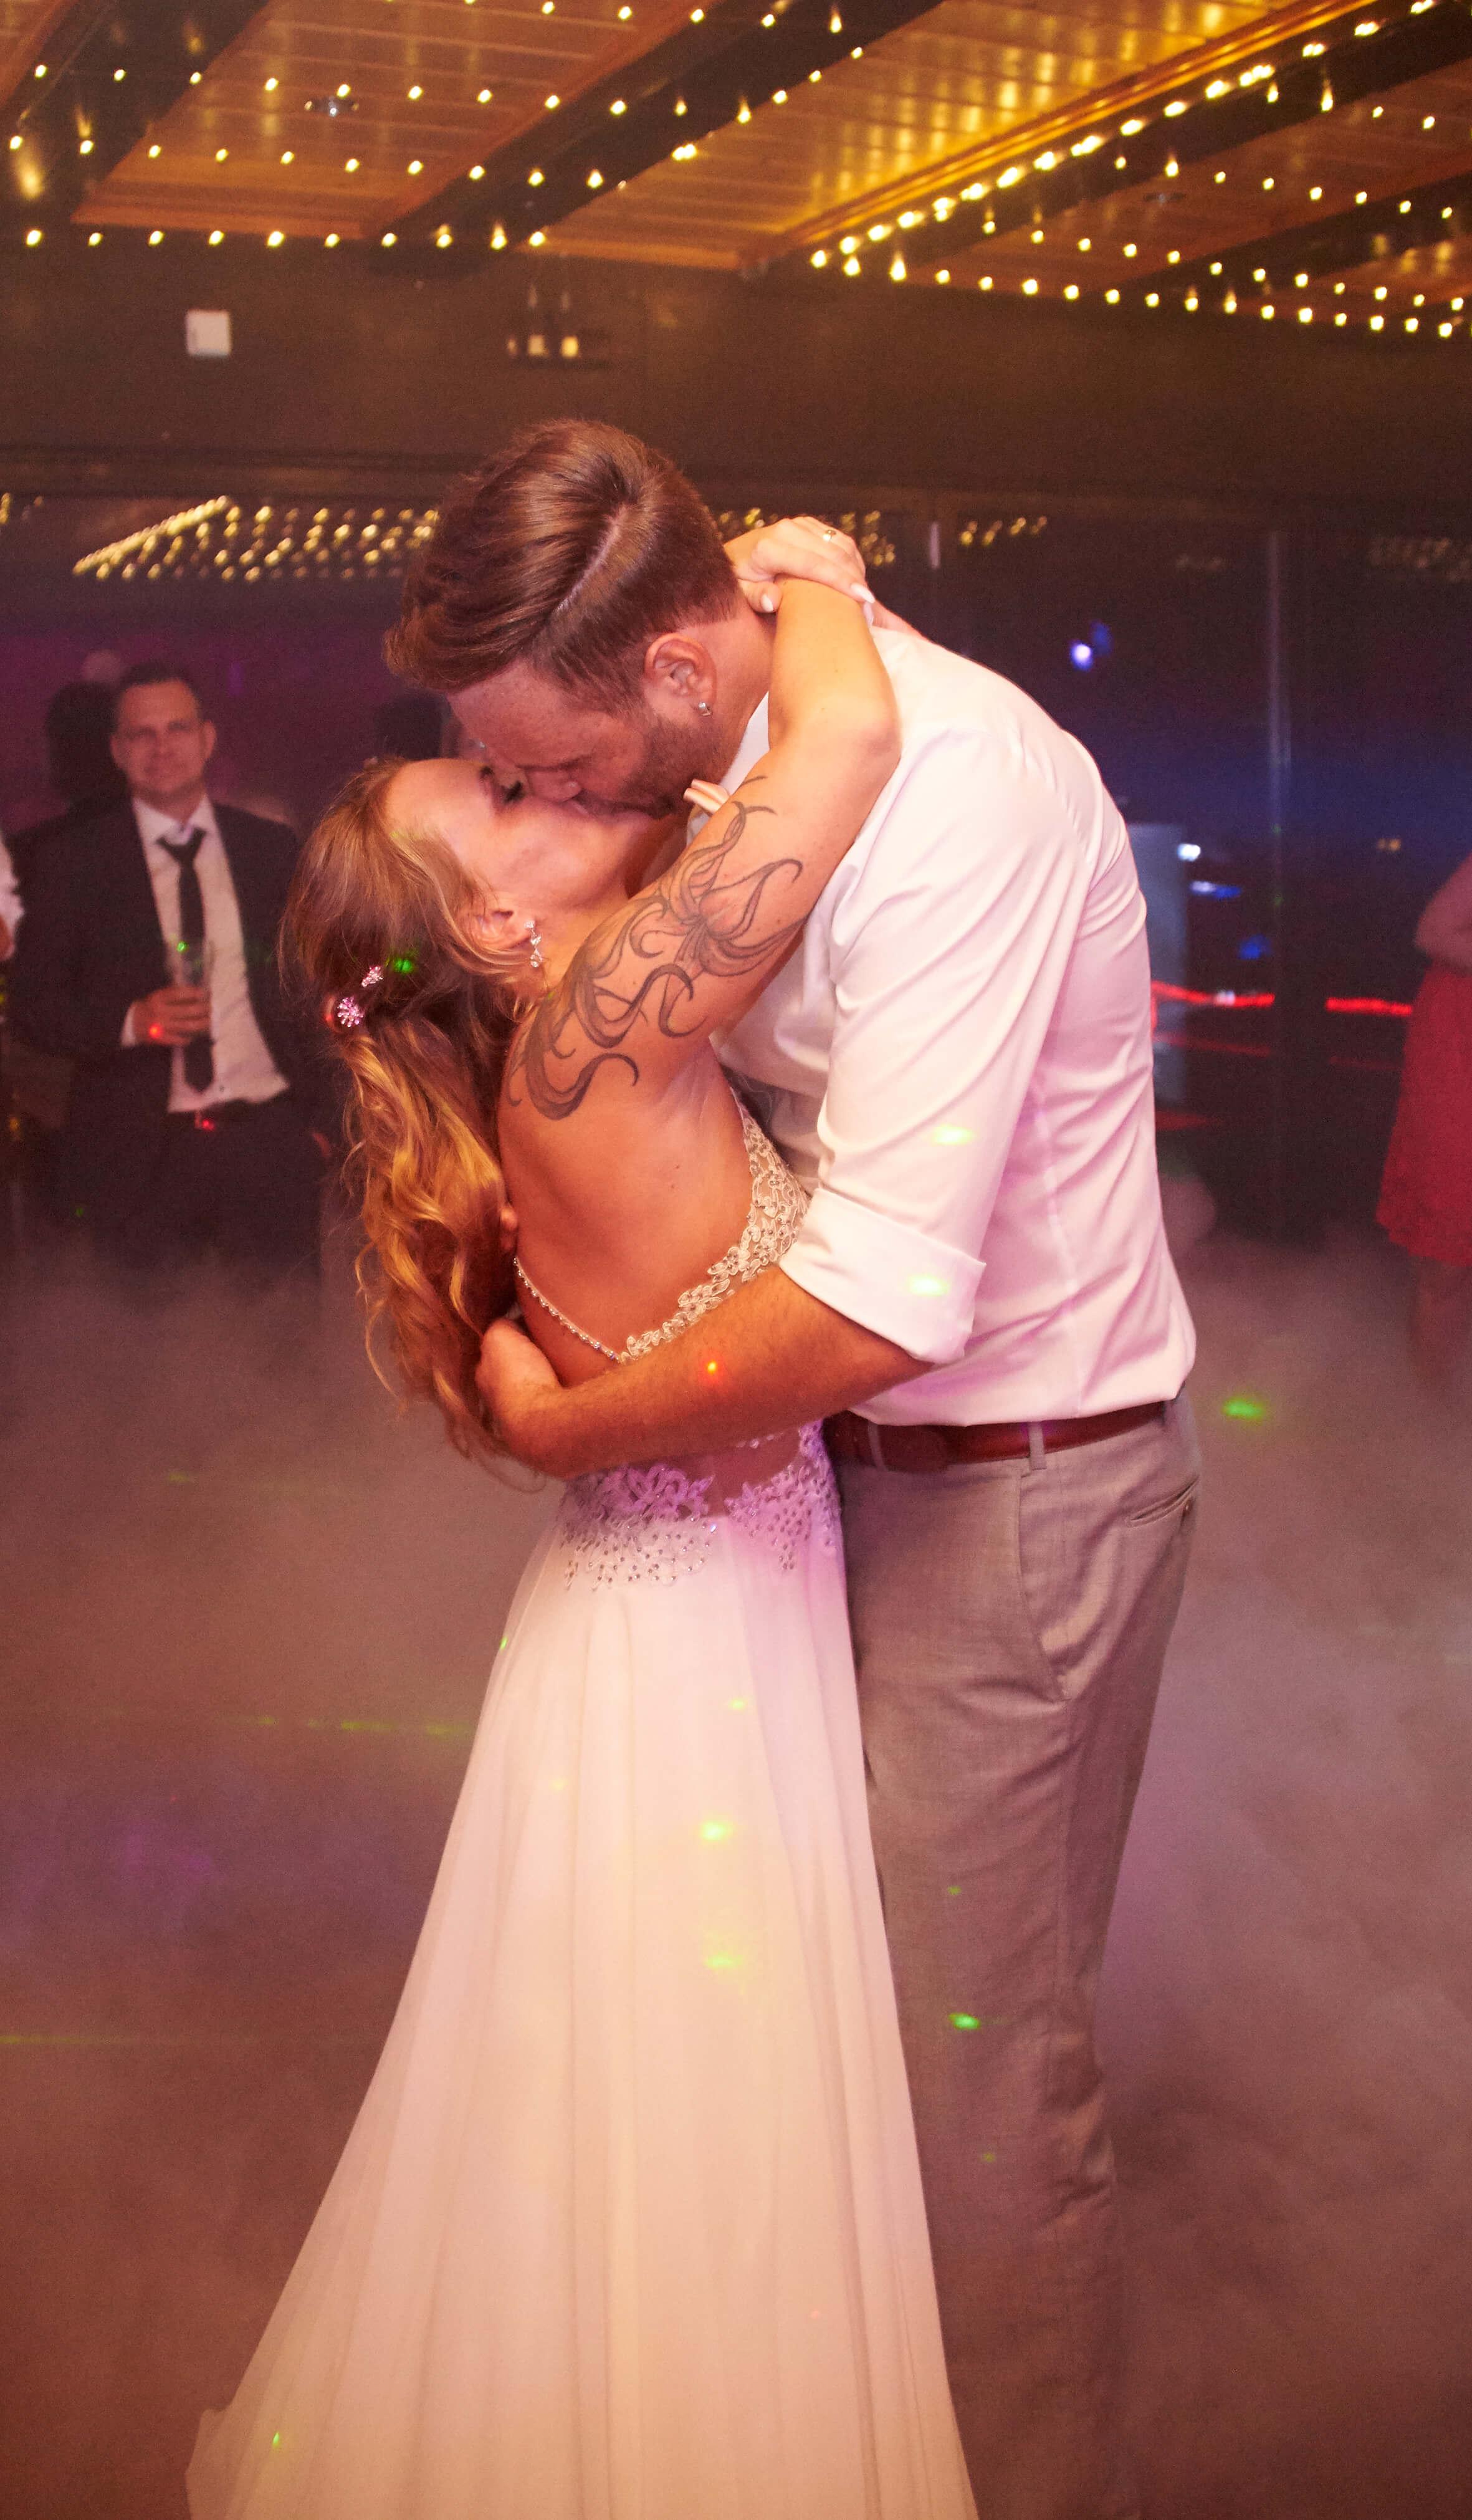 Brautpaartanz & Kuss